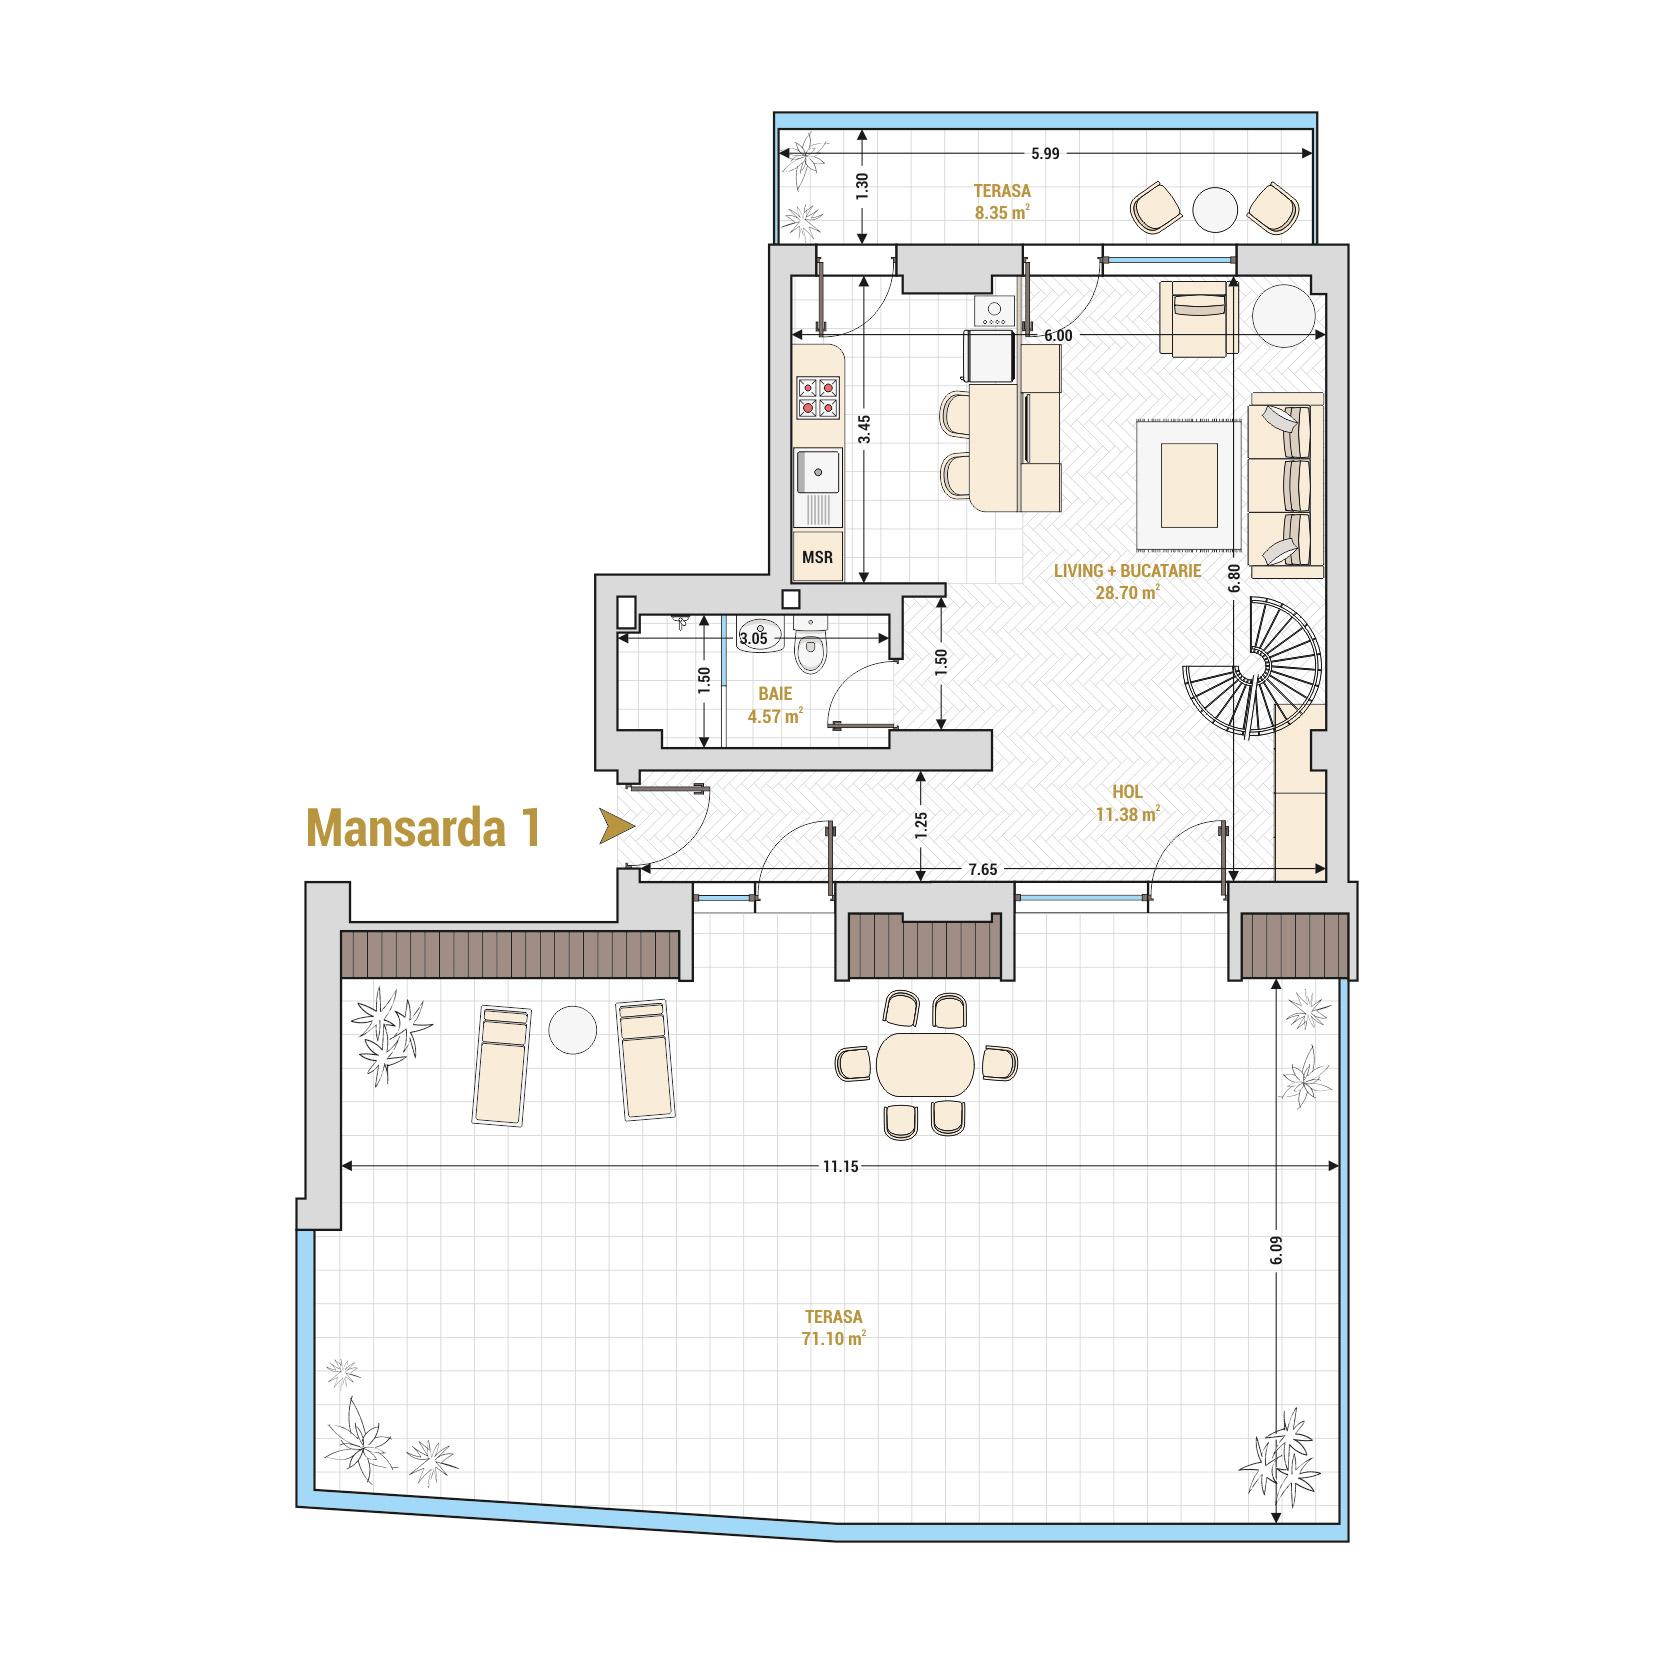 Duplex cu 2 camere de vanzare Bucuresti - Catedral Residence - Marriott, Piata Unirii, 13 Septembrie, Izvor - Tip 4 - T1A - A